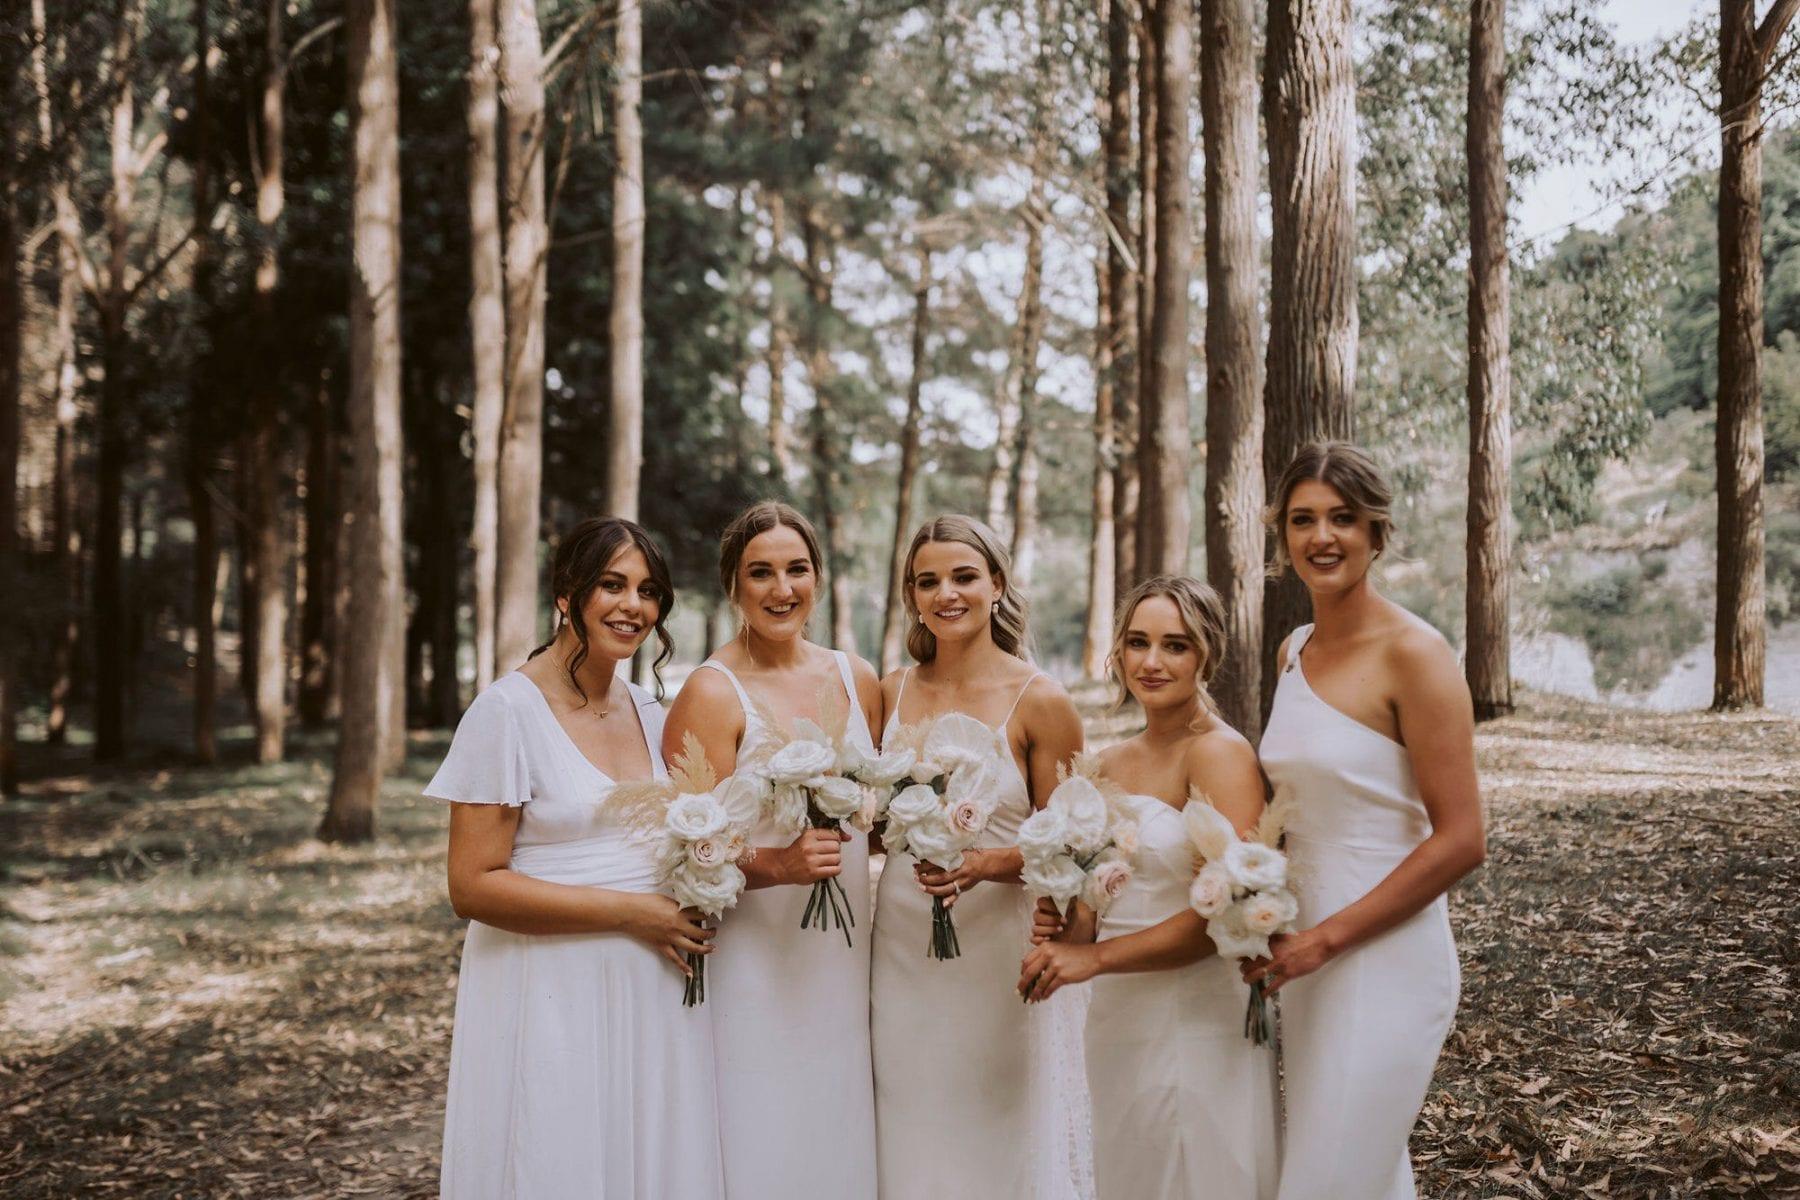 New Zealand Wedding Photographer  David Le Design & Photography www.davidle.co.nz